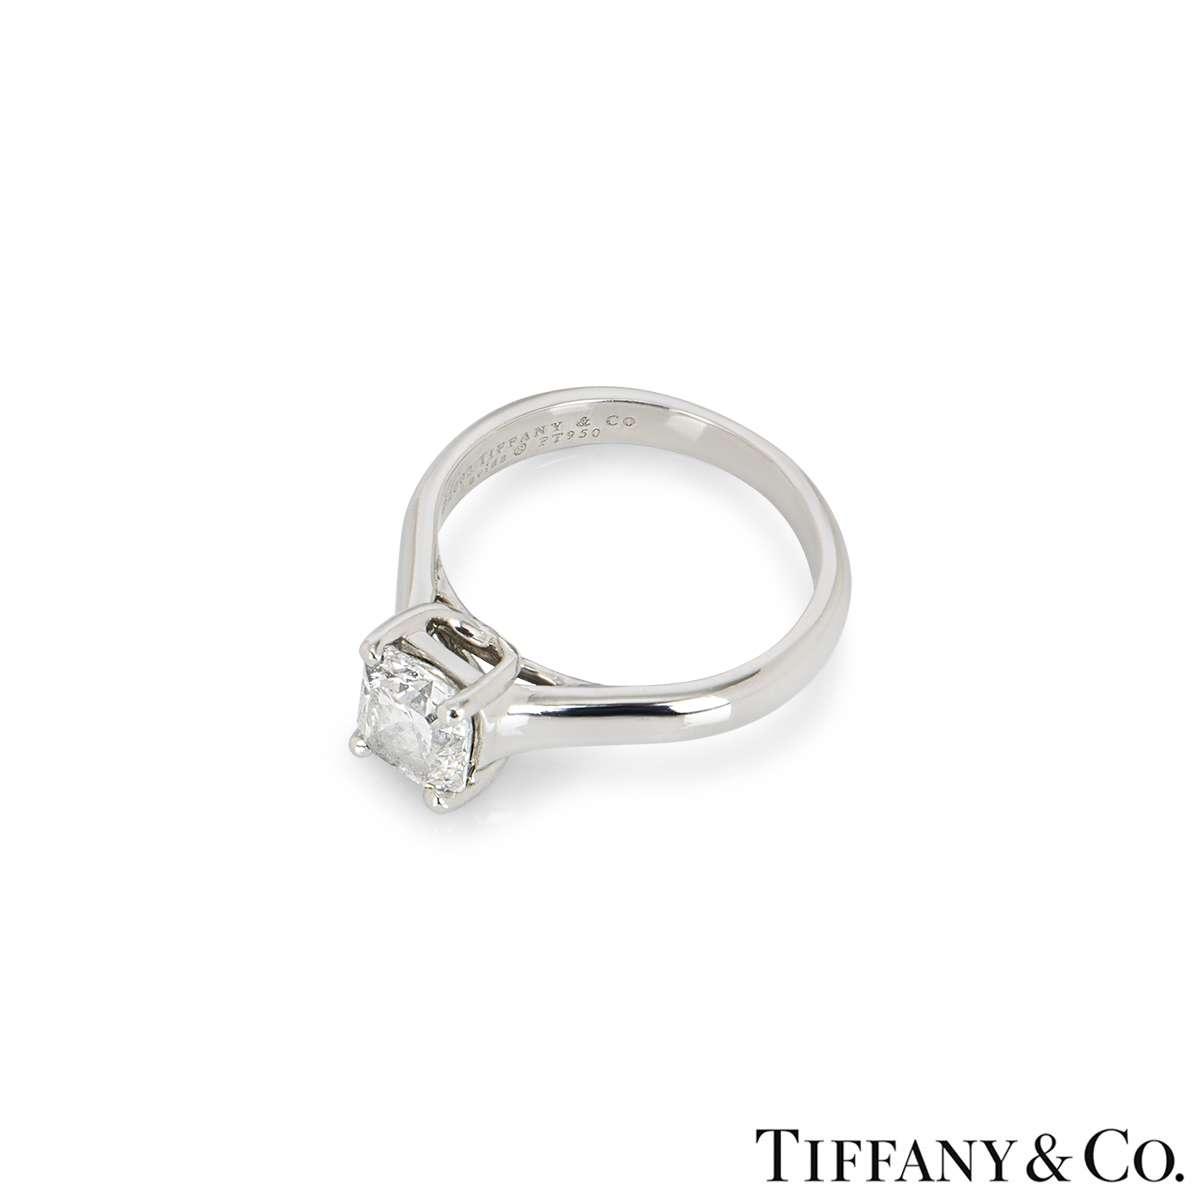 Tiffany & Co. Platinum Diamond Lucida Ring 1.13ct D/VVS2